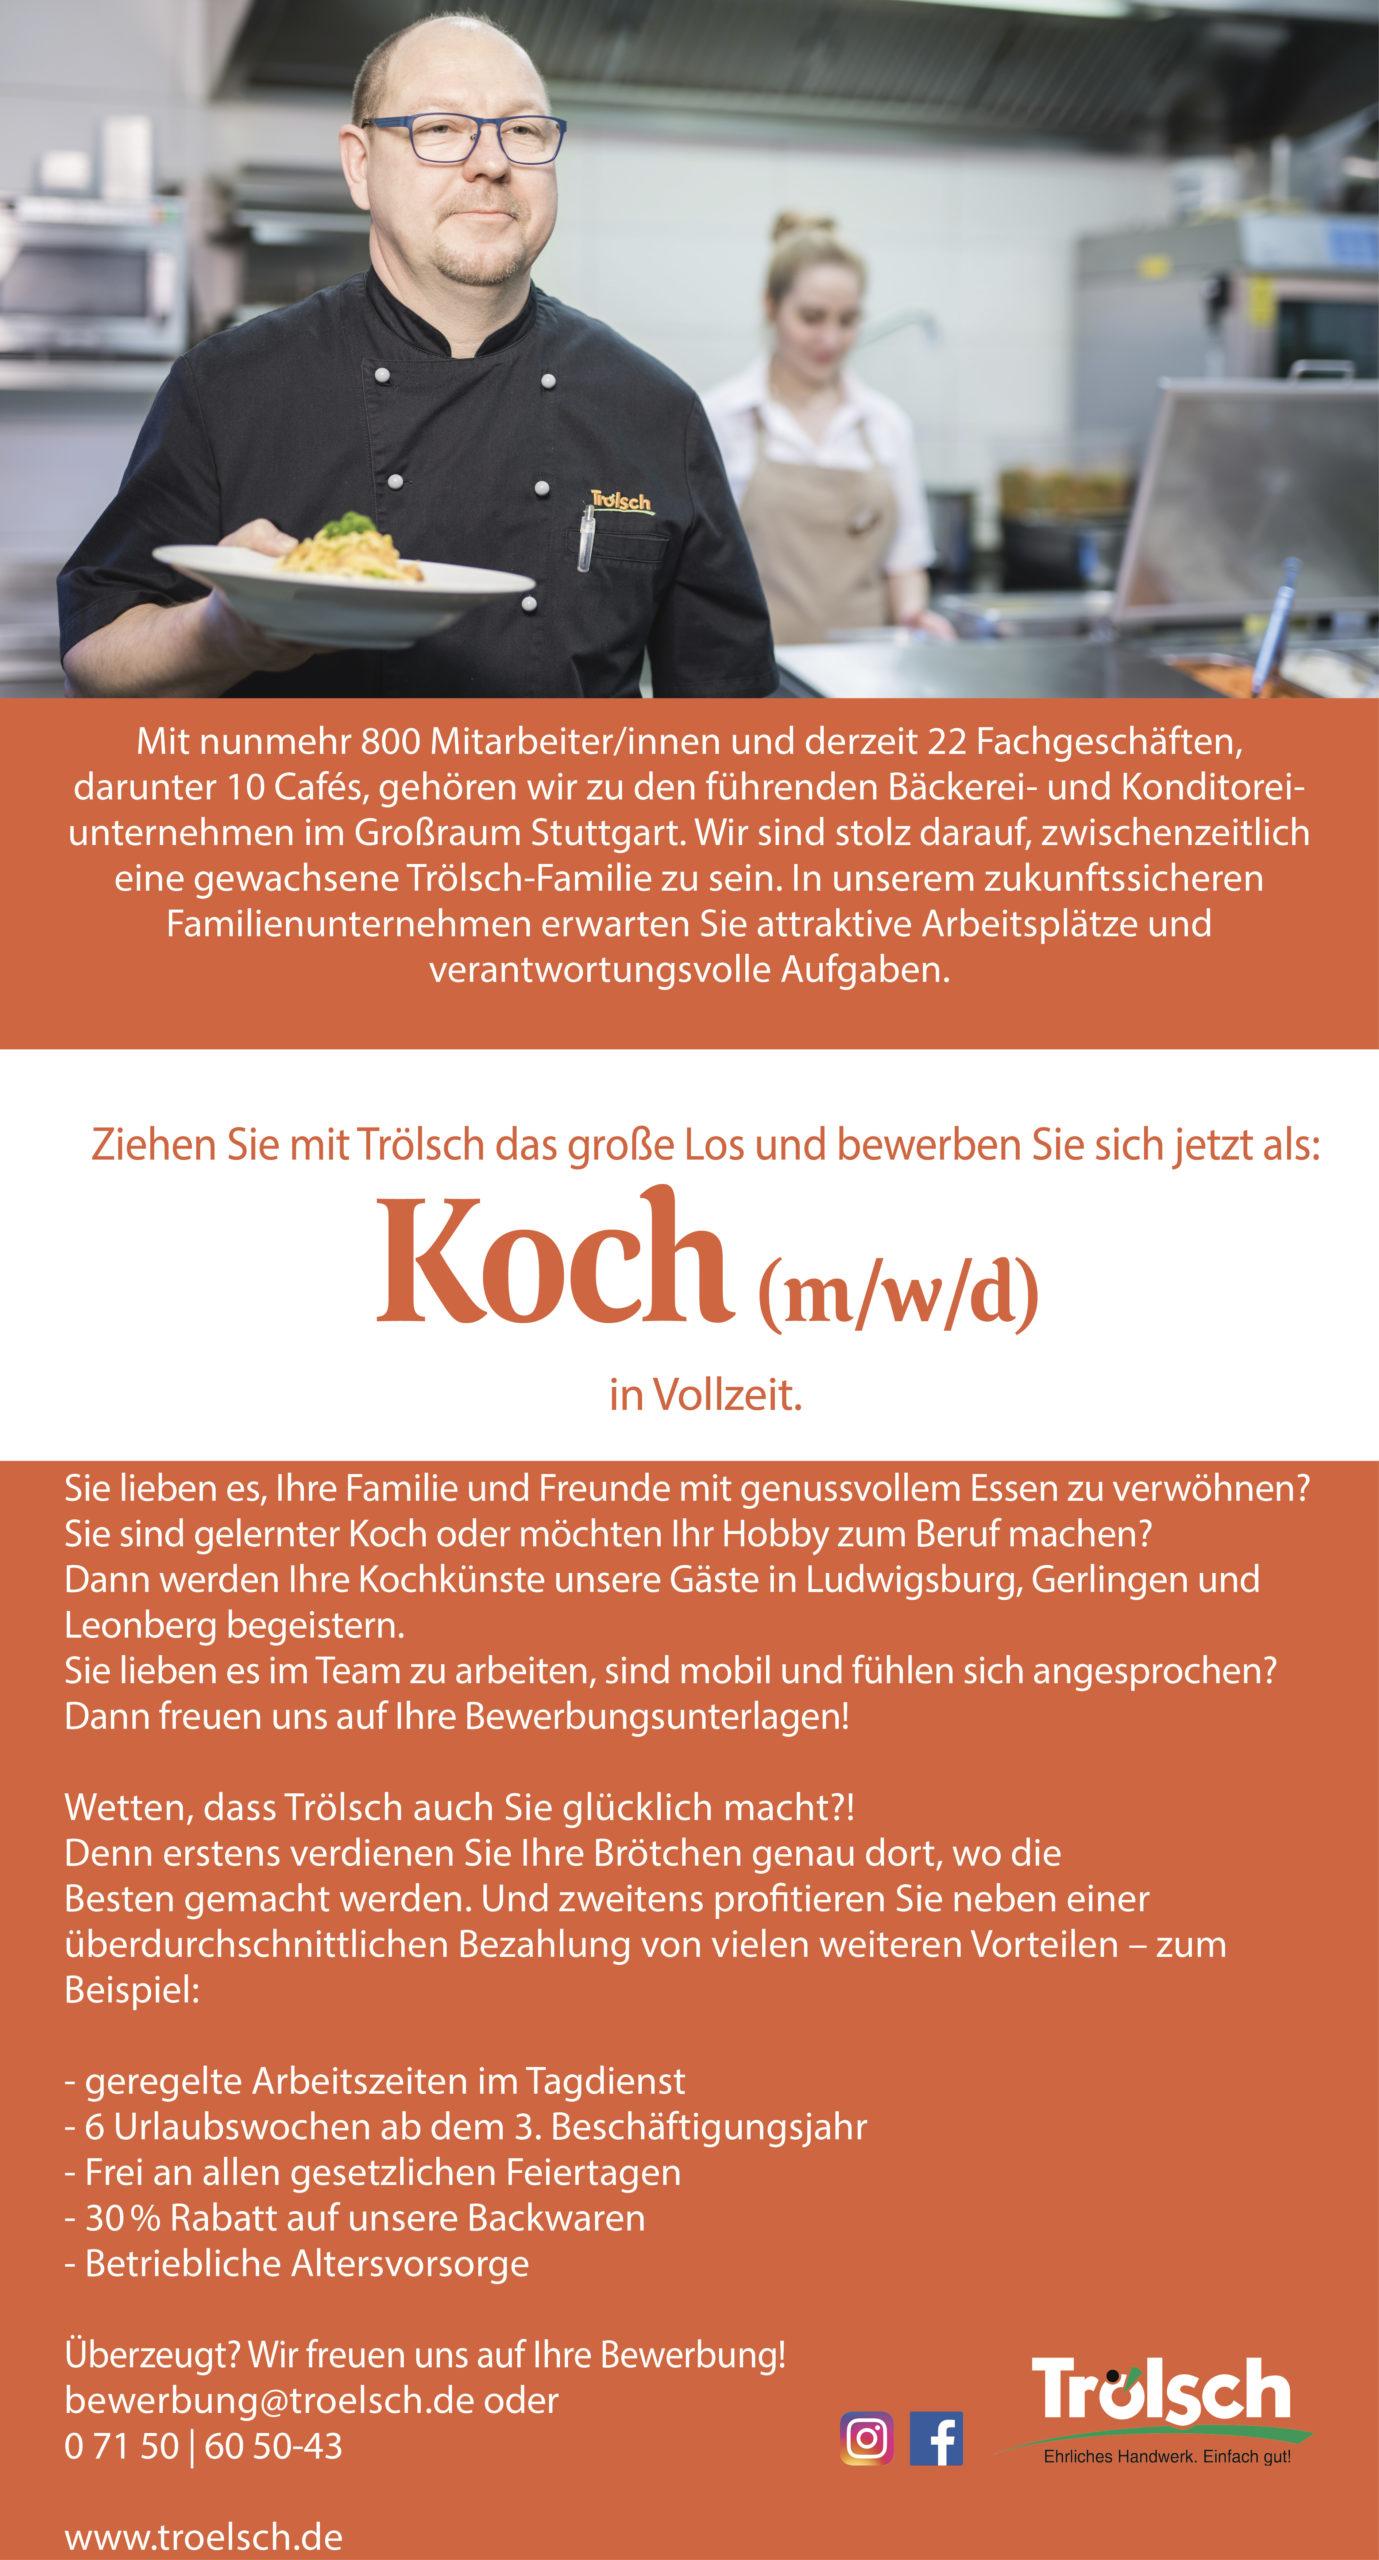 Bild Stellenangebot: Koch